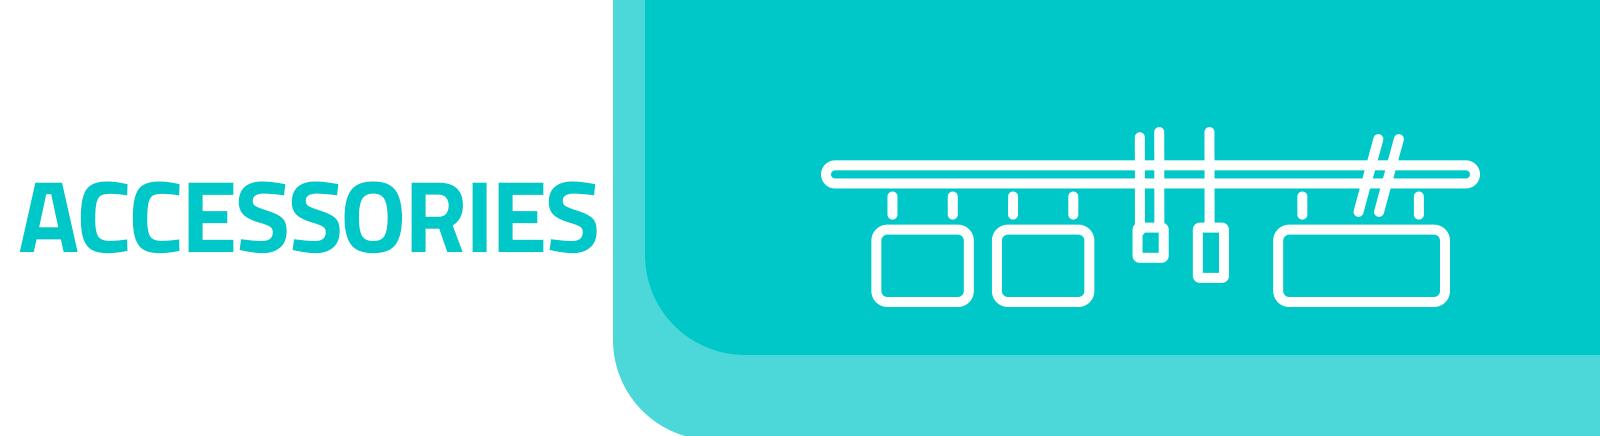 Kitchen tools and accessories, kitchenware